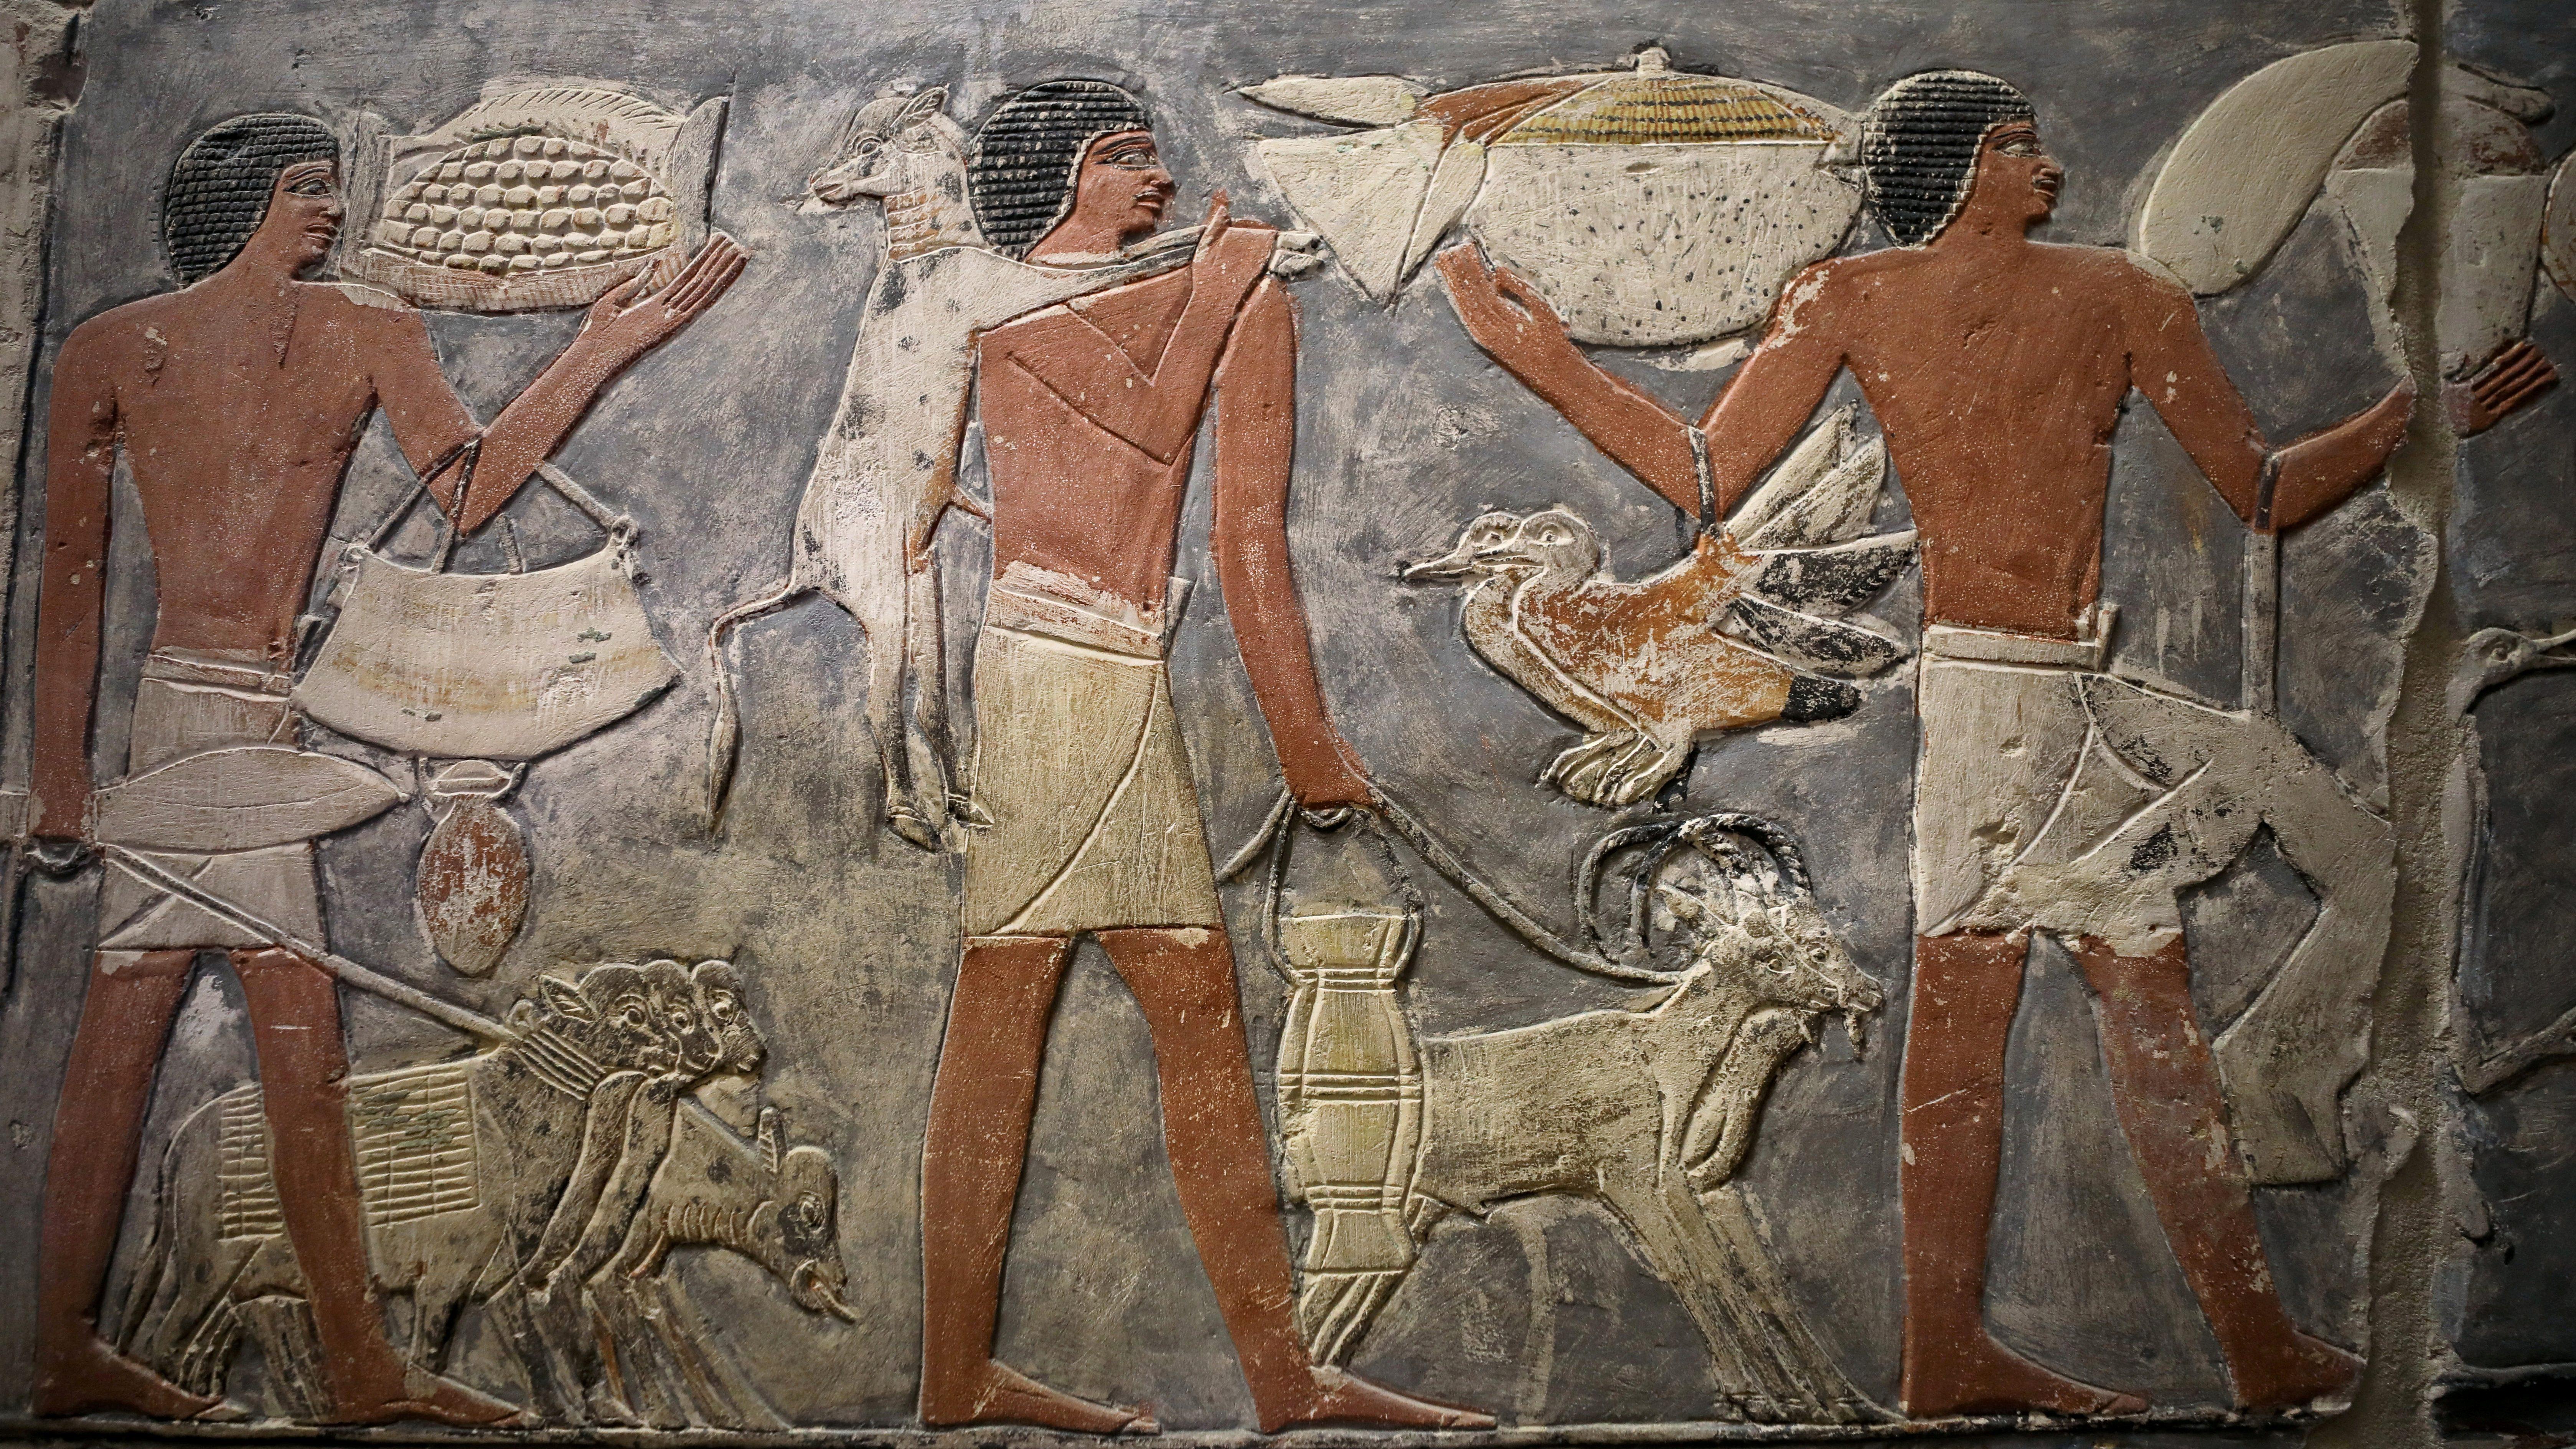 A wall of Egyptian Hieroglyphics